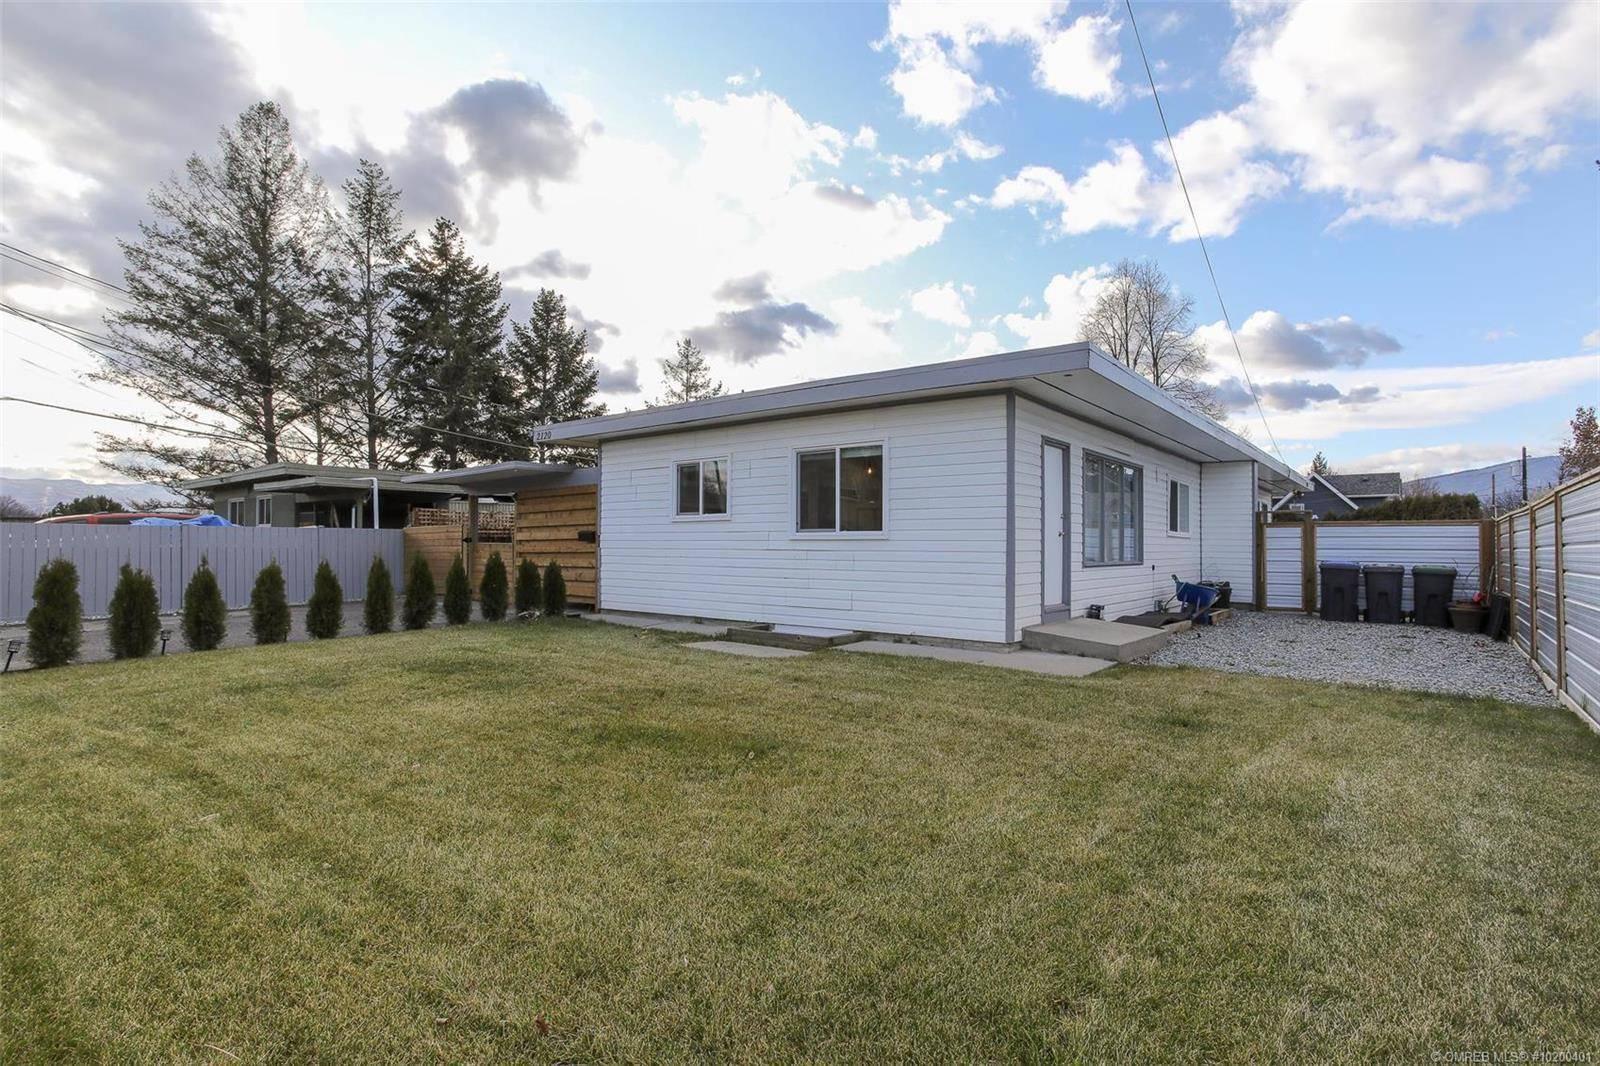 Townhouse for sale at 2120 Ethel St Kelowna British Columbia - MLS: 10200401